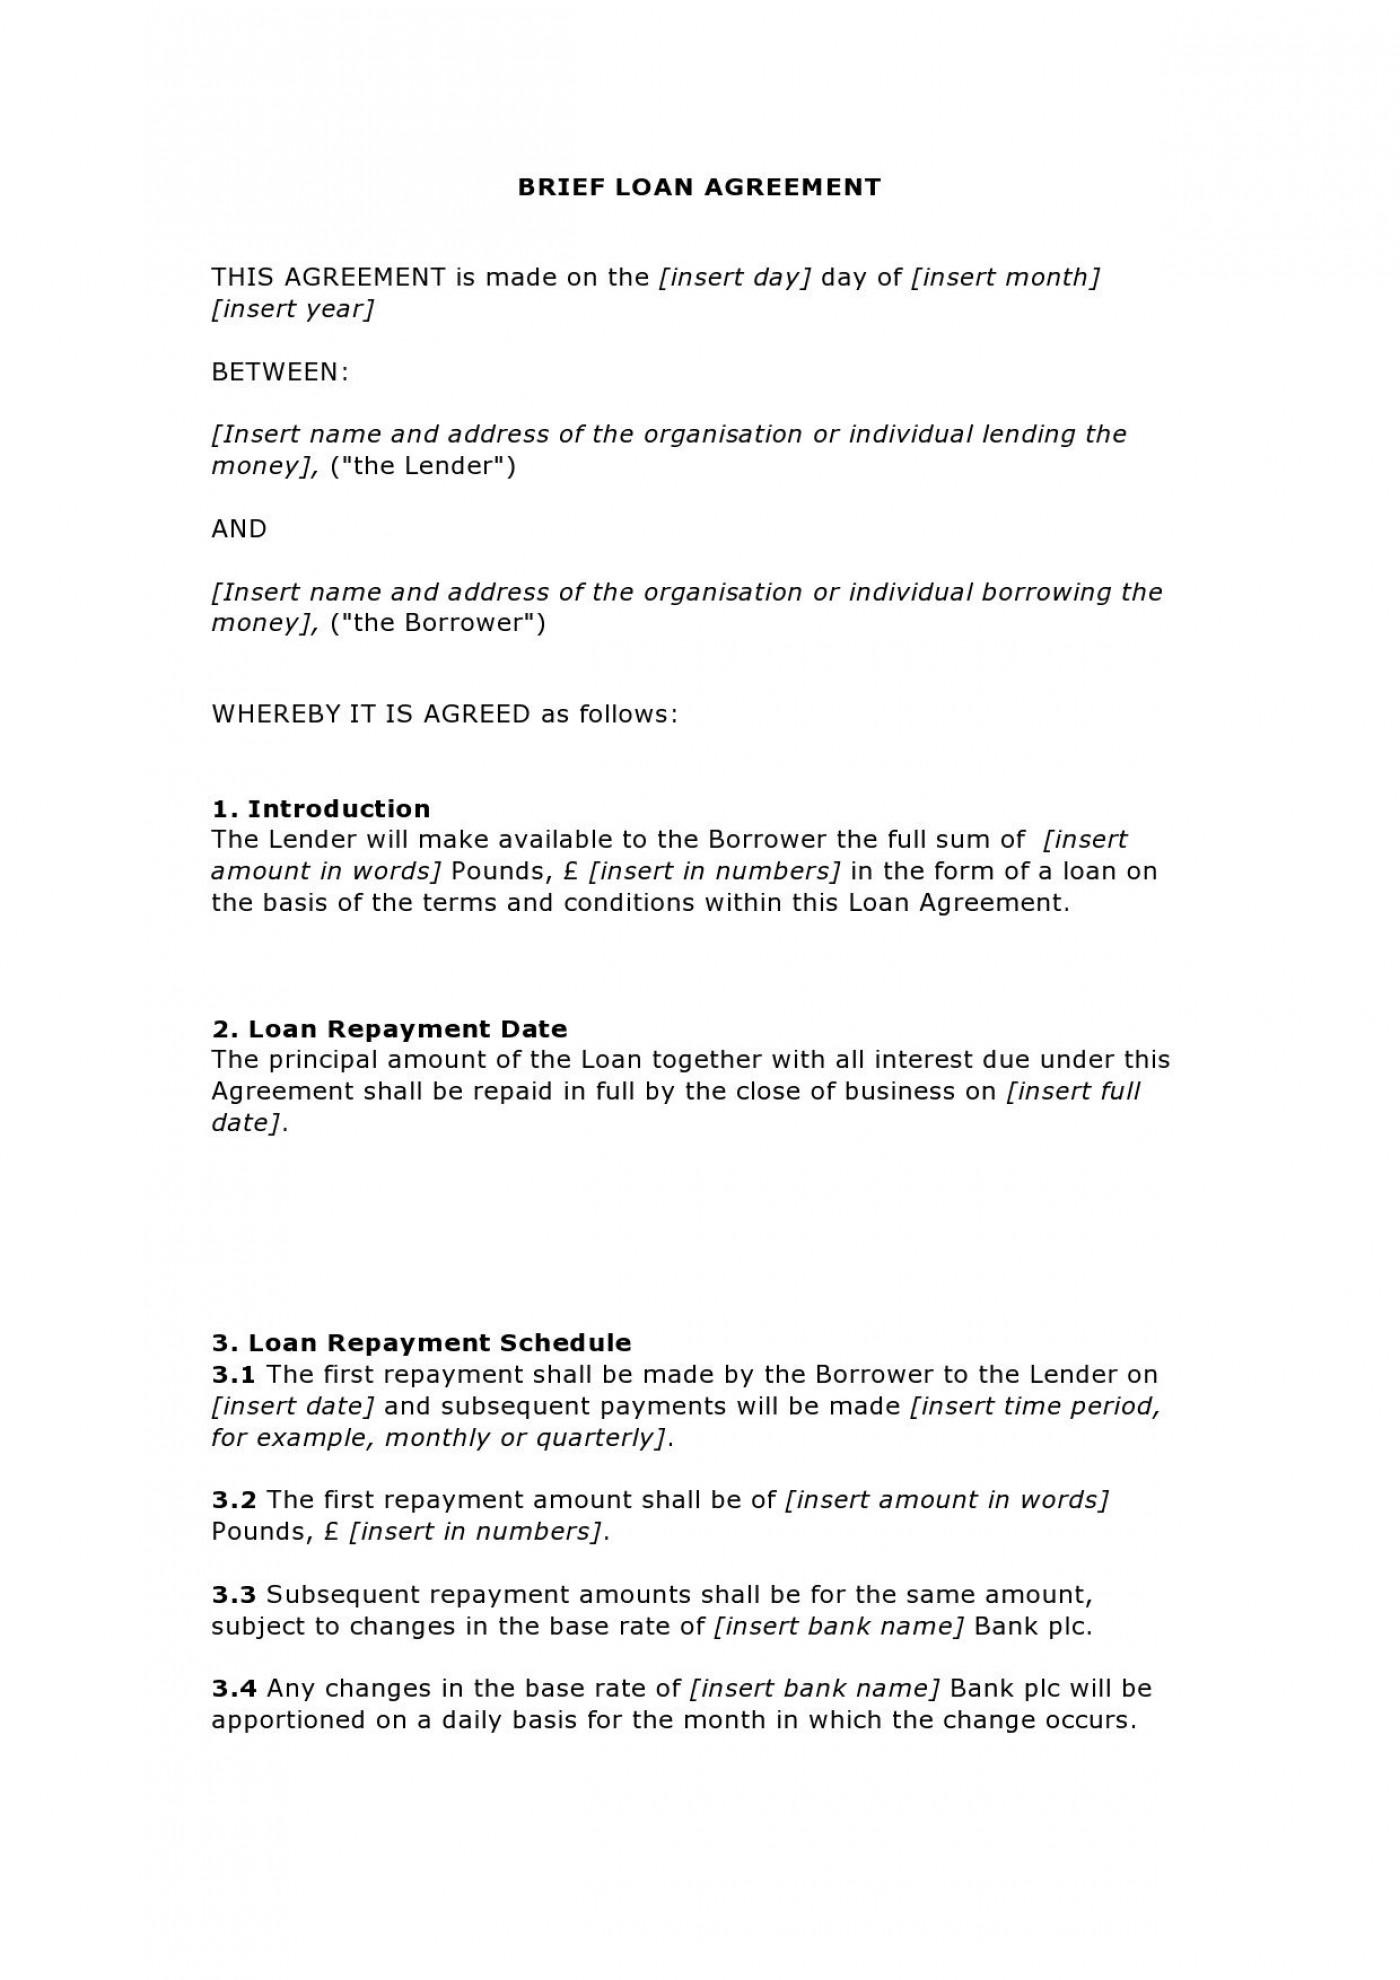 003 Unforgettable Family Loan Agreement Template Uk Free Idea 1400